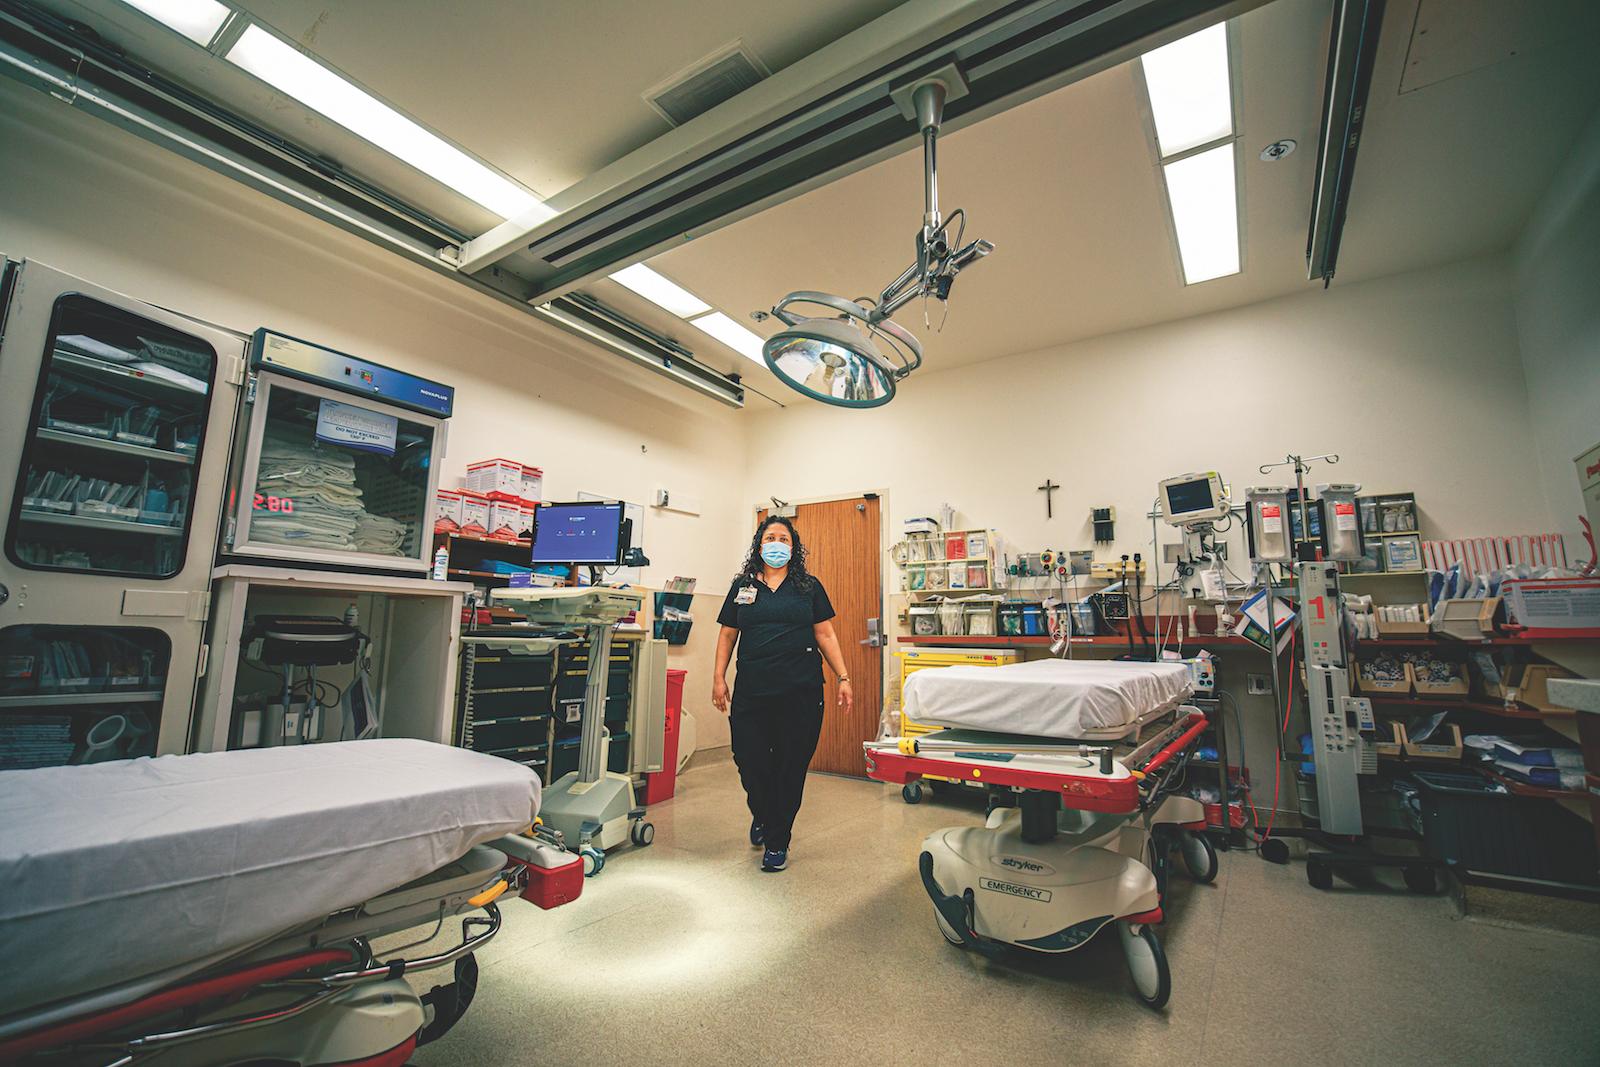 nurse in hospital room